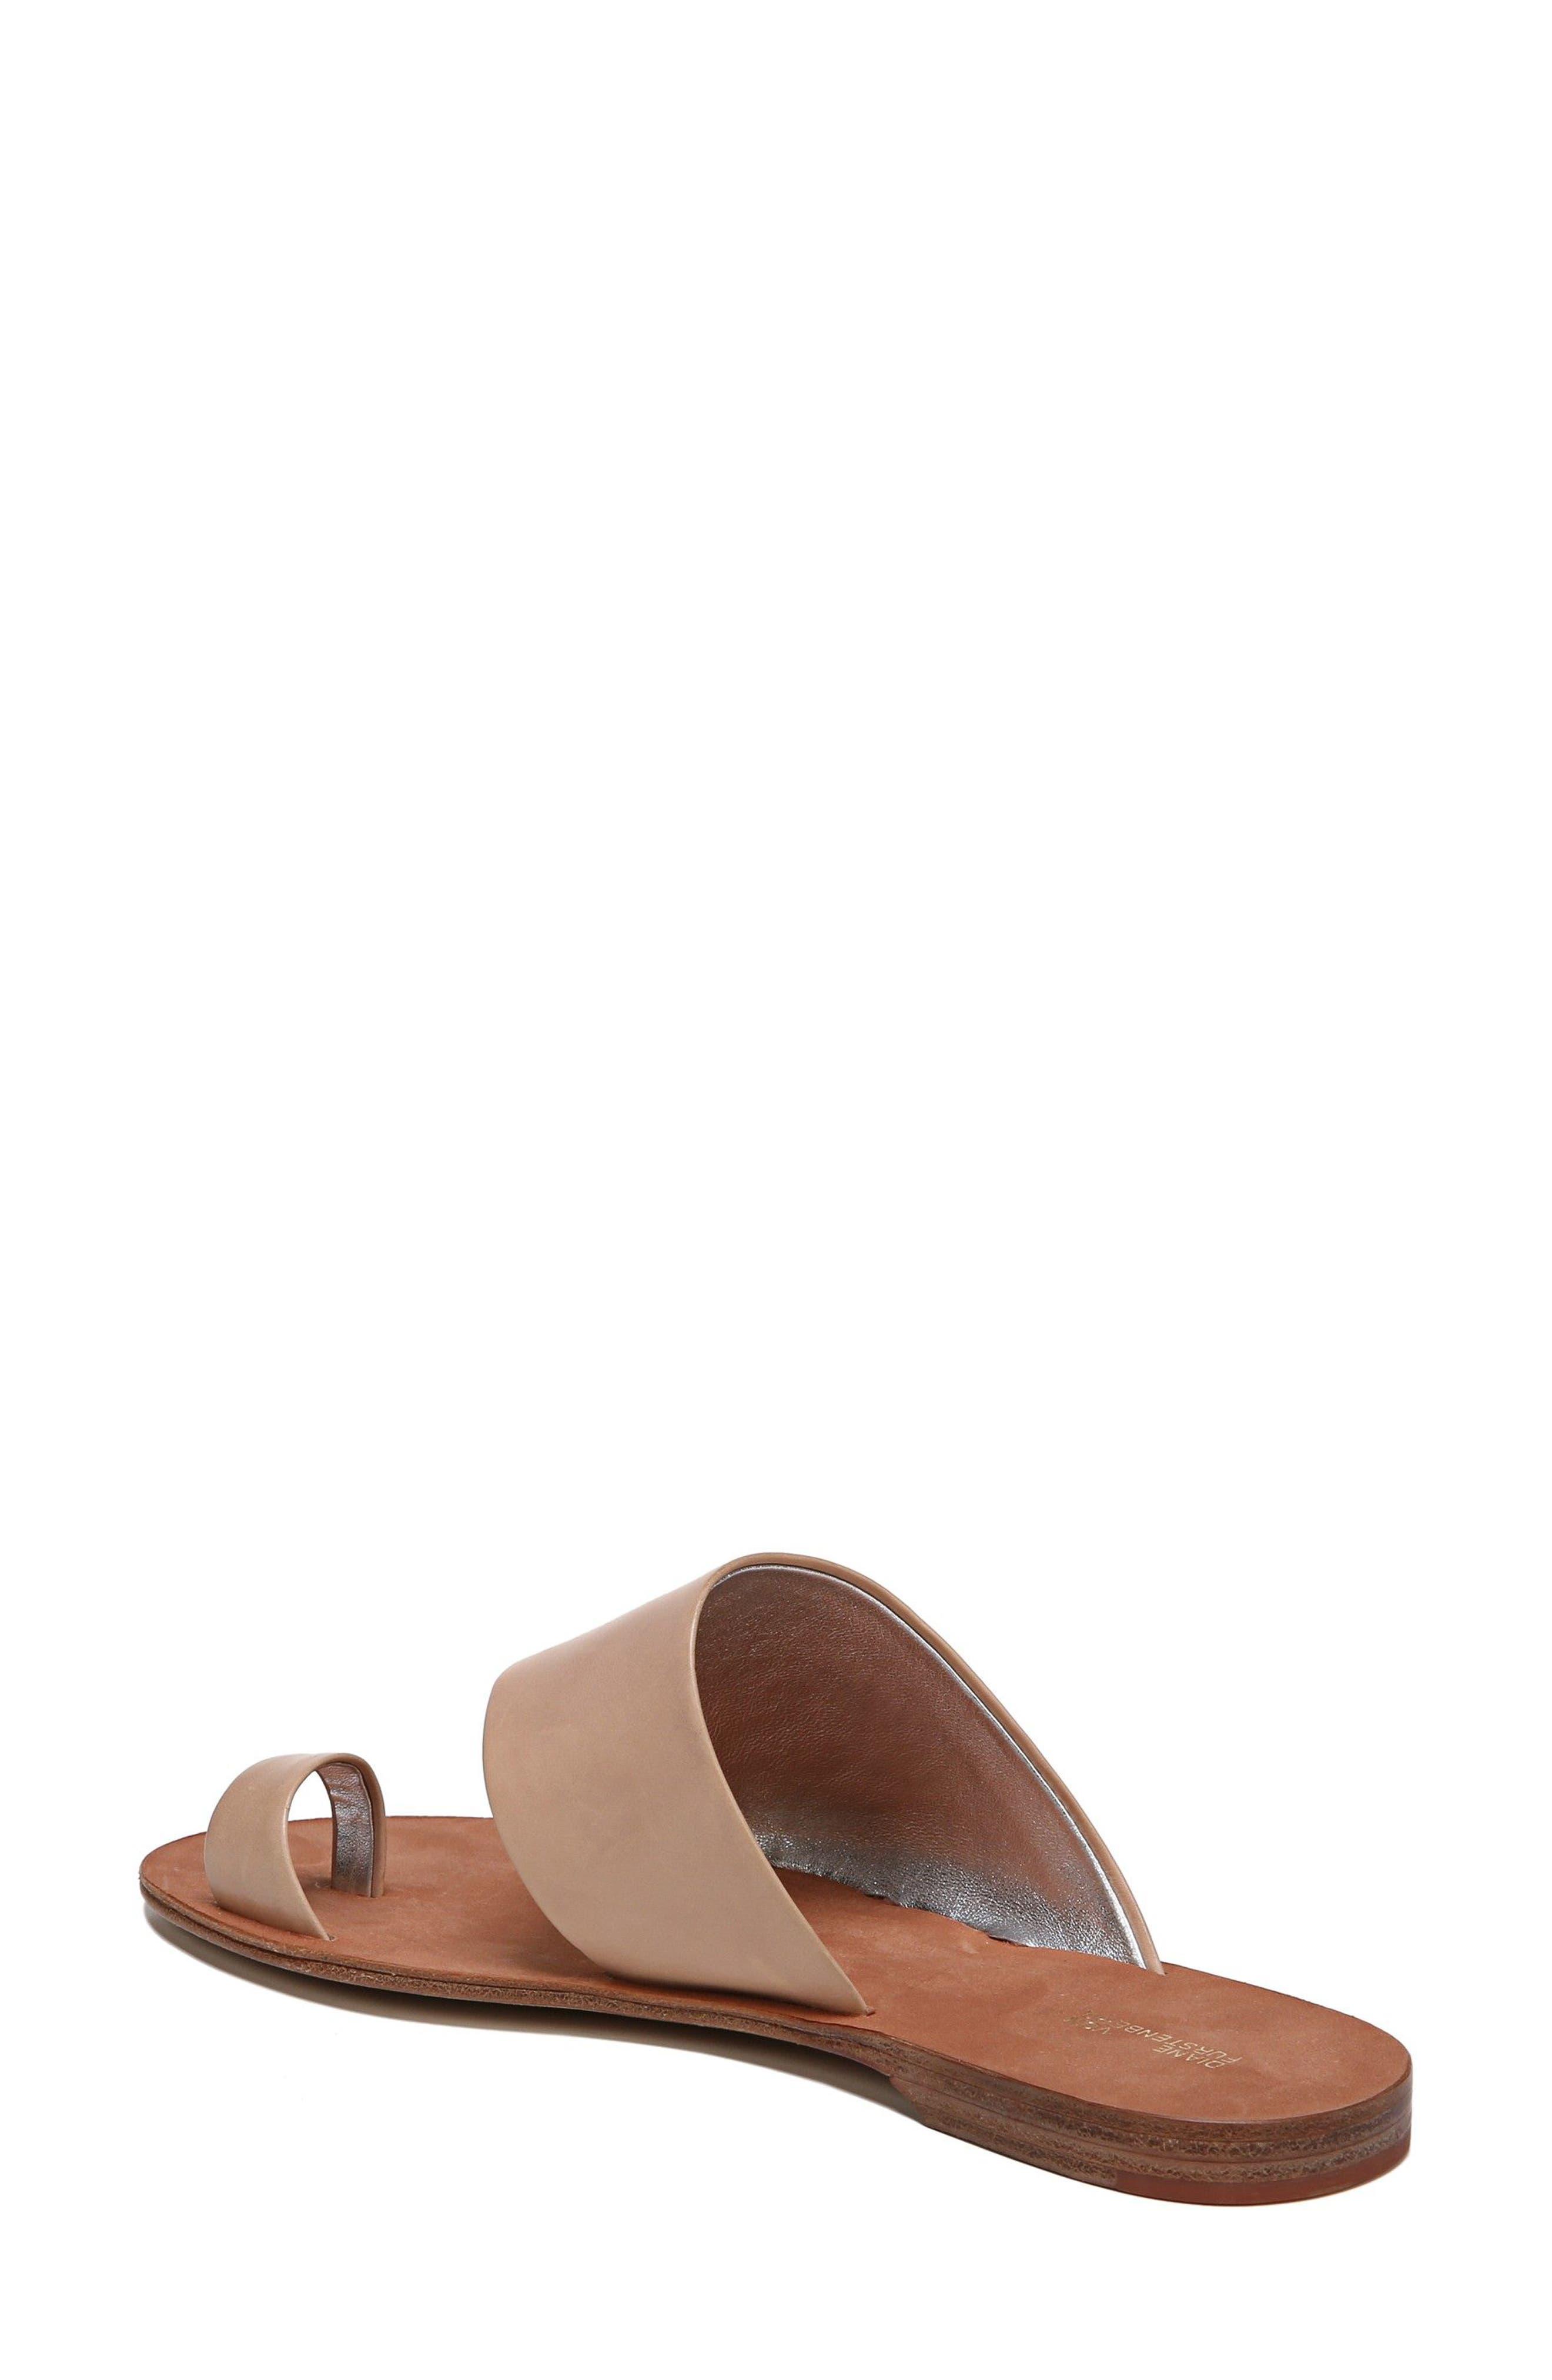 Brittany Asymmetrical Flat Sandal,                             Alternate thumbnail 2, color,                             202